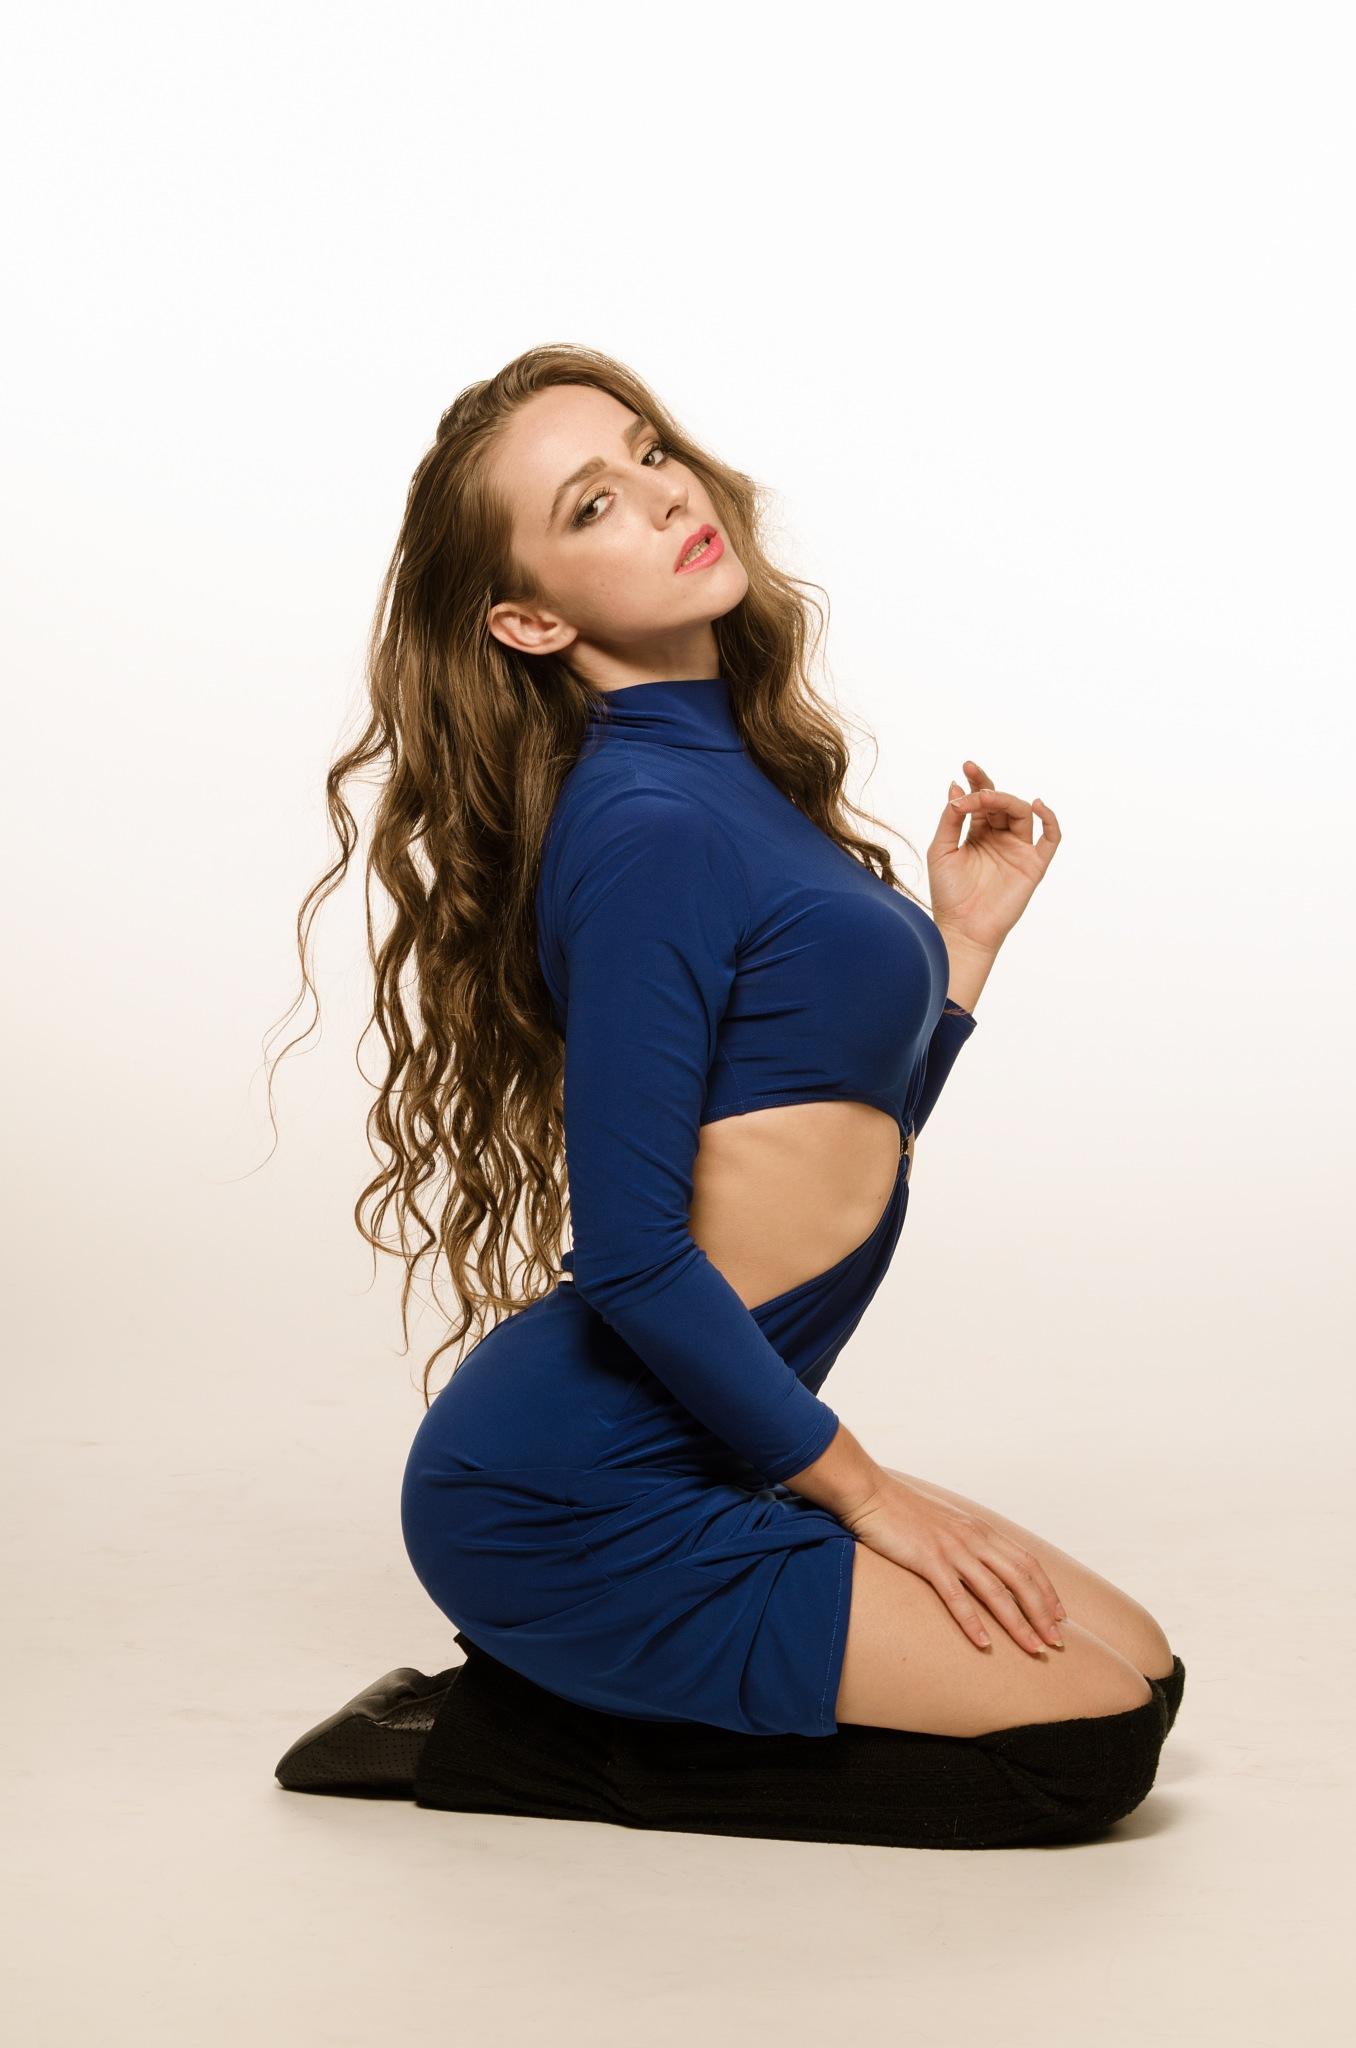 Anastasia by capyBara